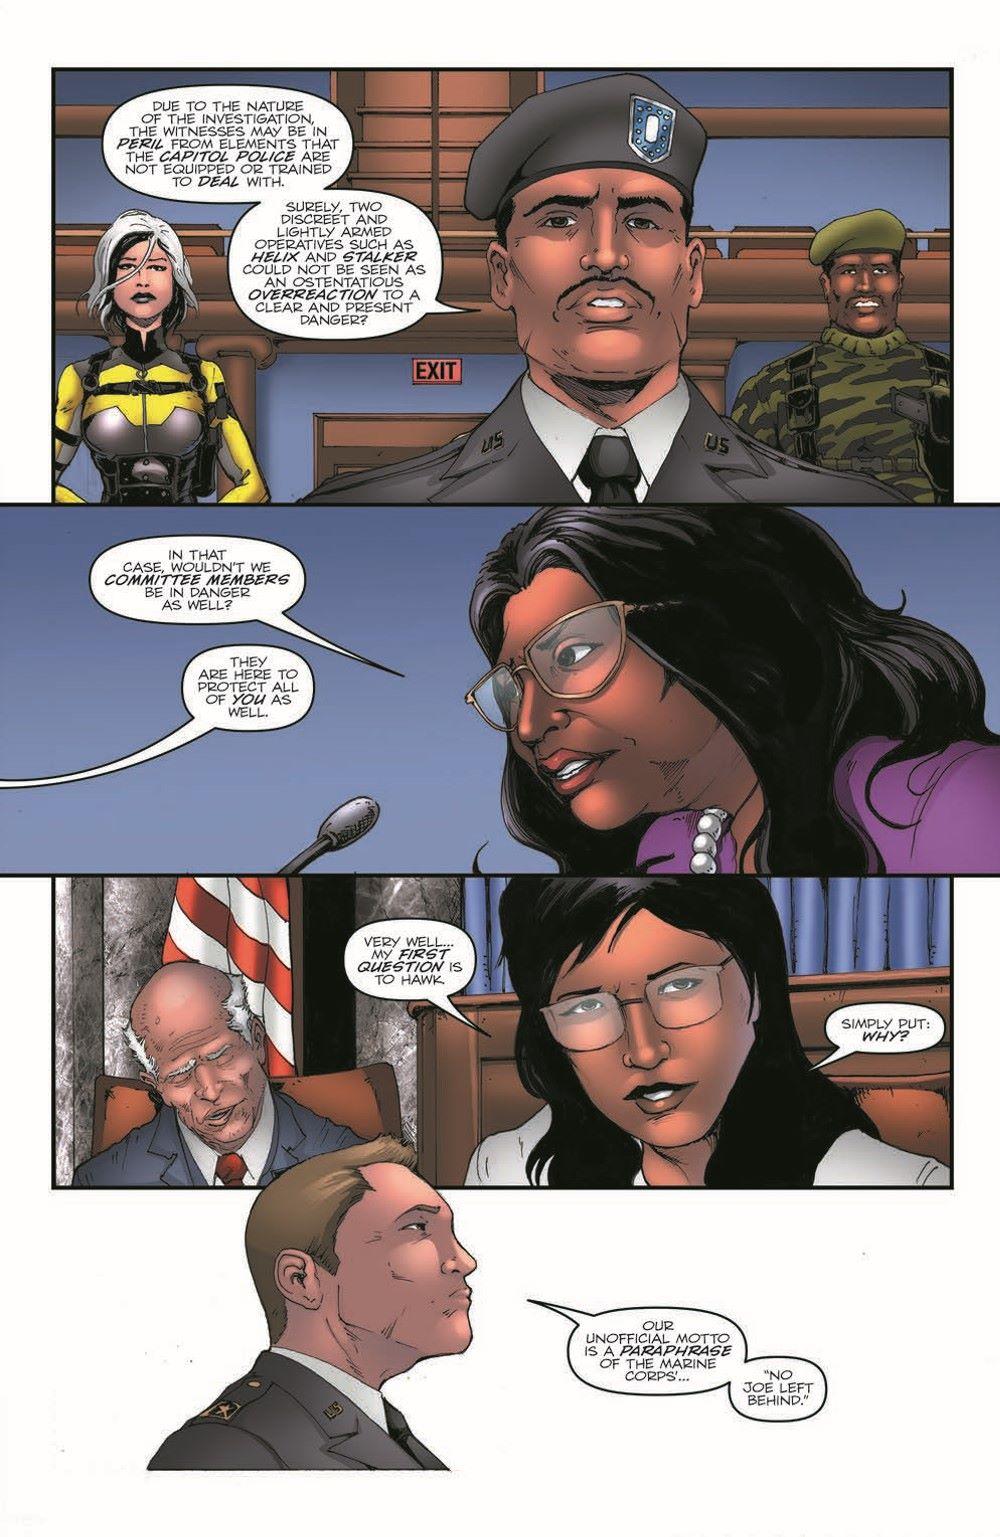 GIJoeRAH282-pr-5 ComicList Previews: G.I. JOE A REAL AMERICAN HERO #282